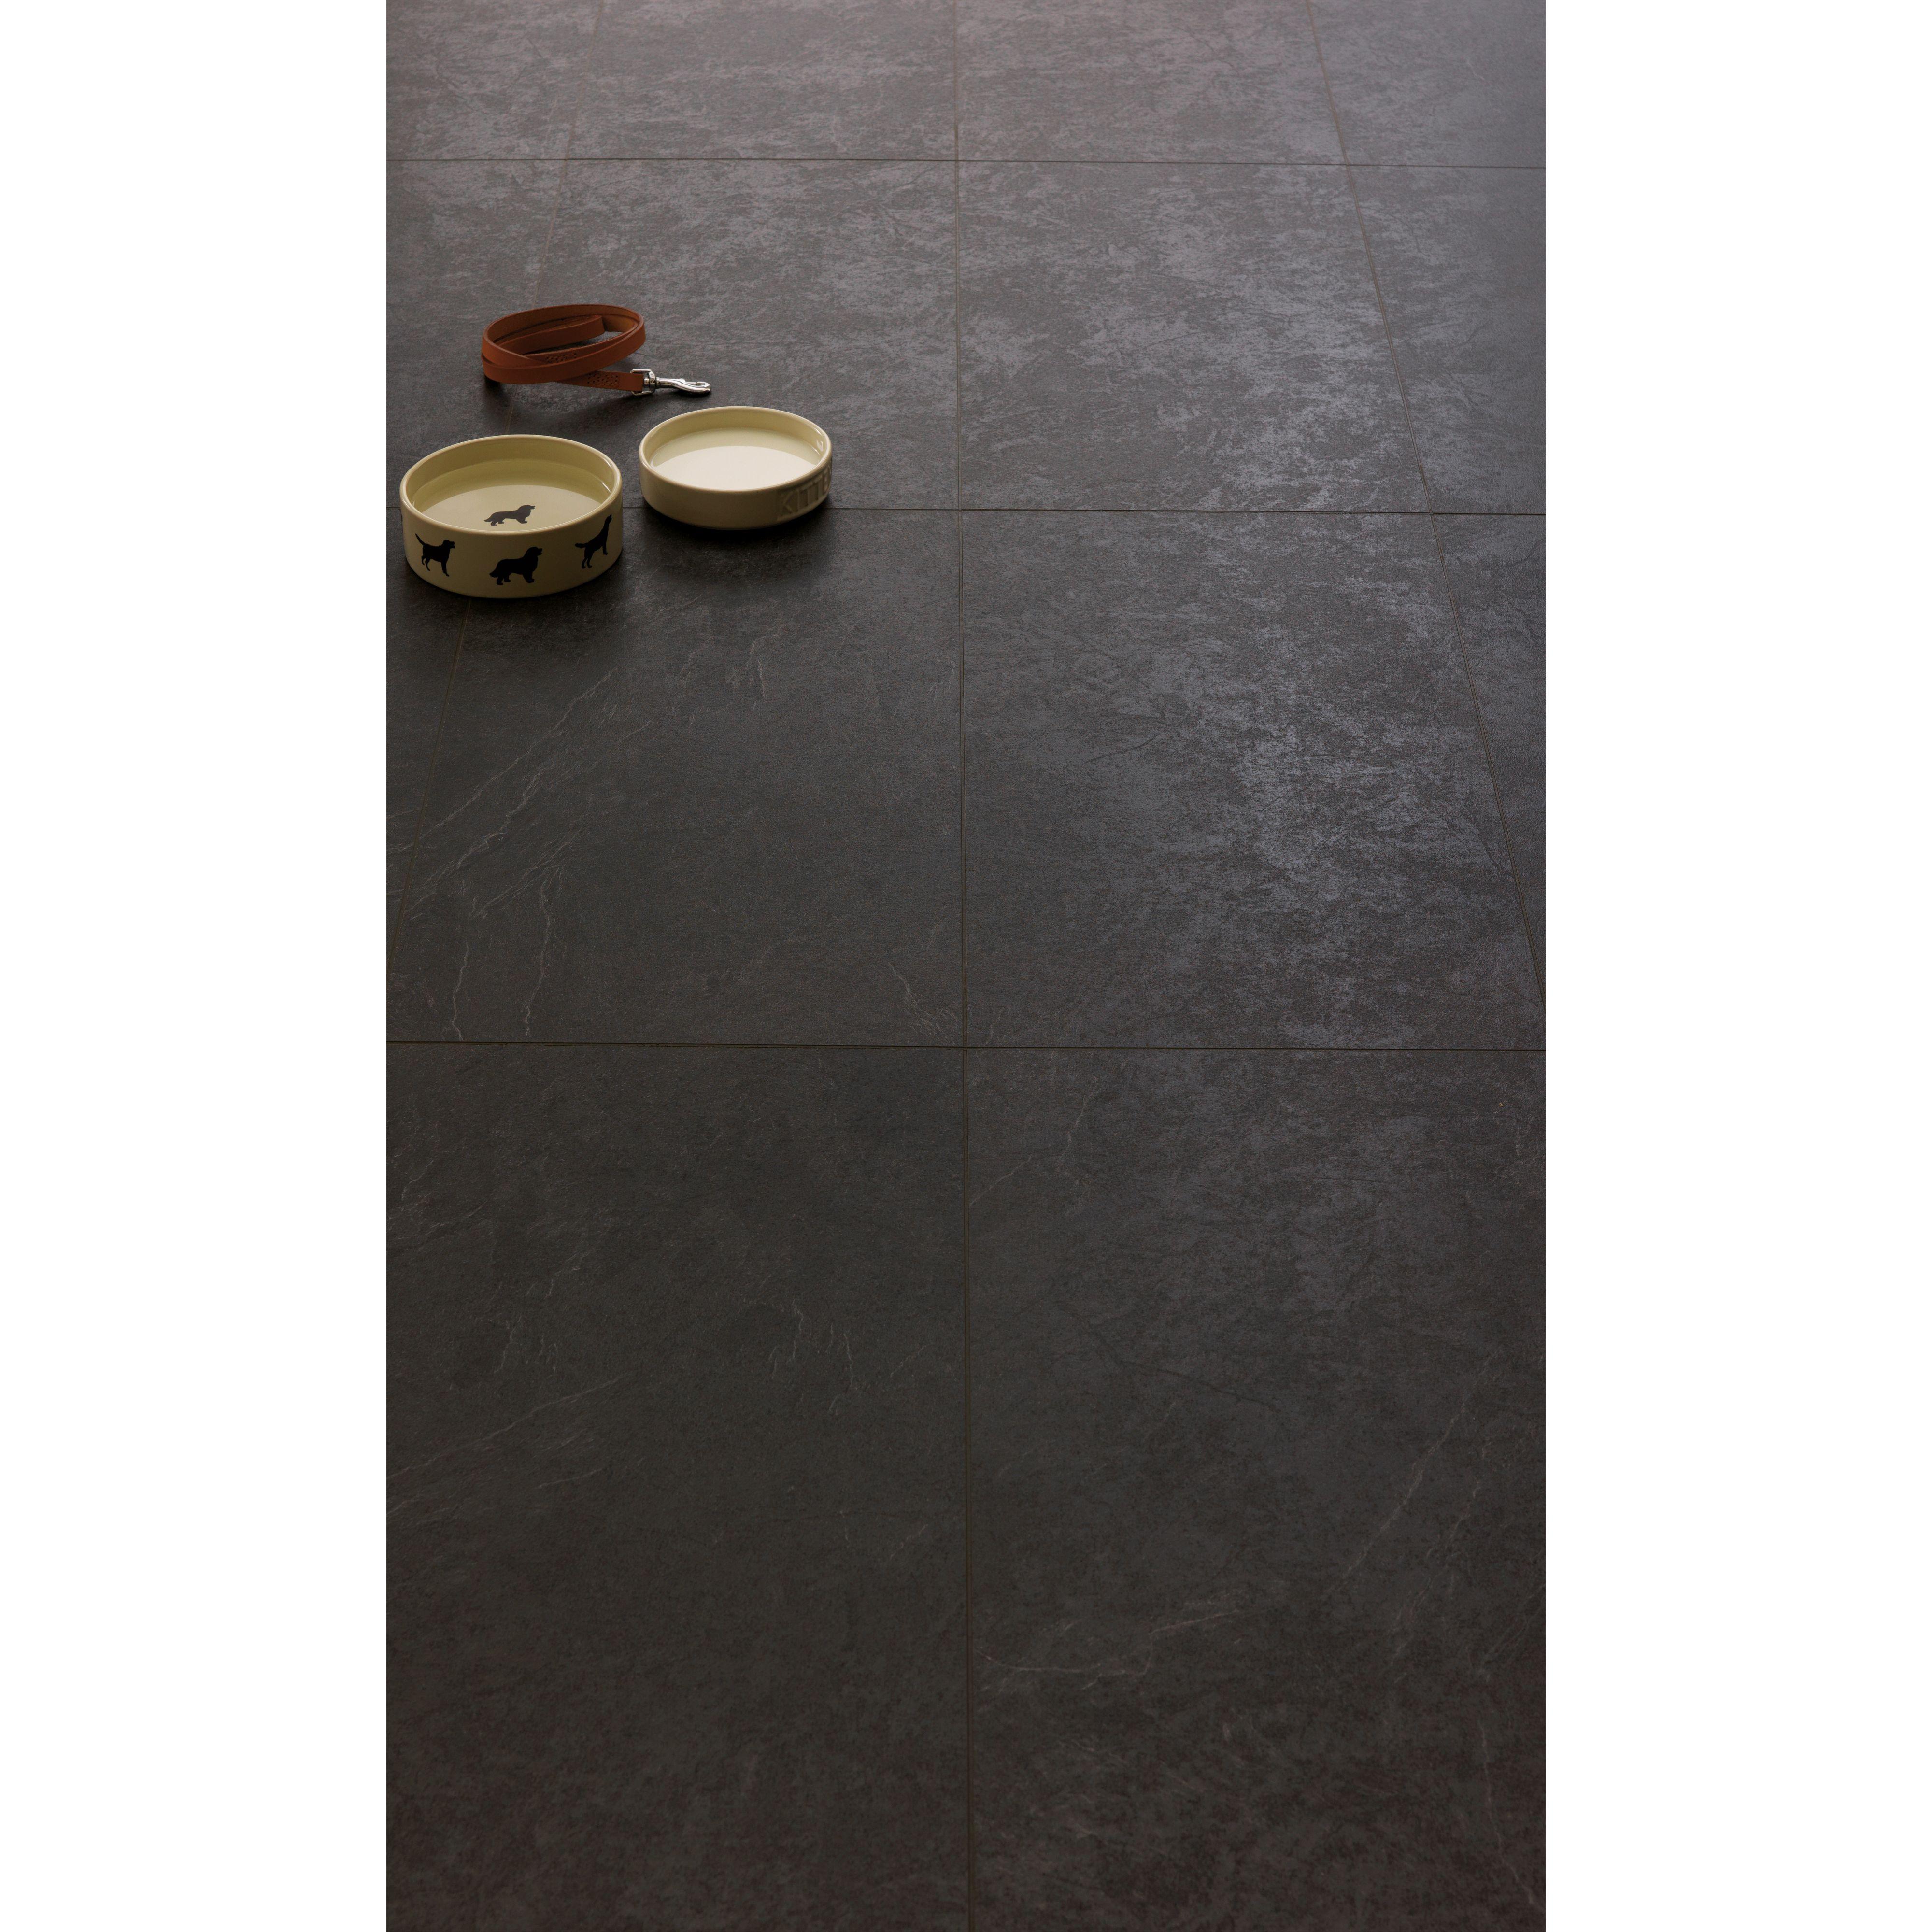 Tile Effect Laminate Flooring, Black Travertine Laminate Flooring